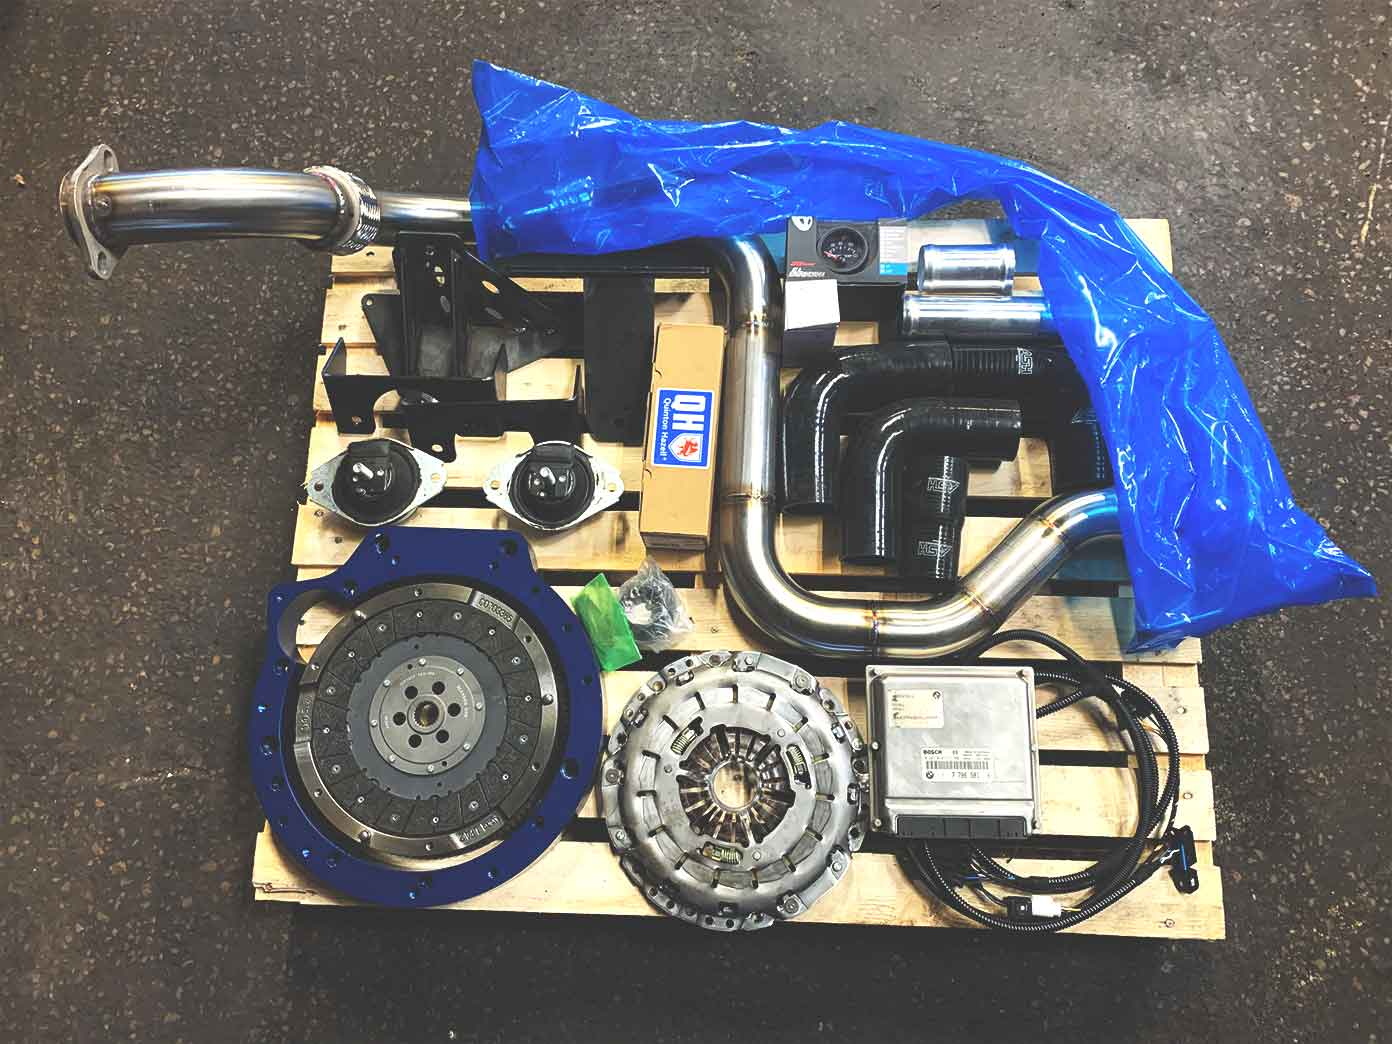 BMW engine conversion DIY kit